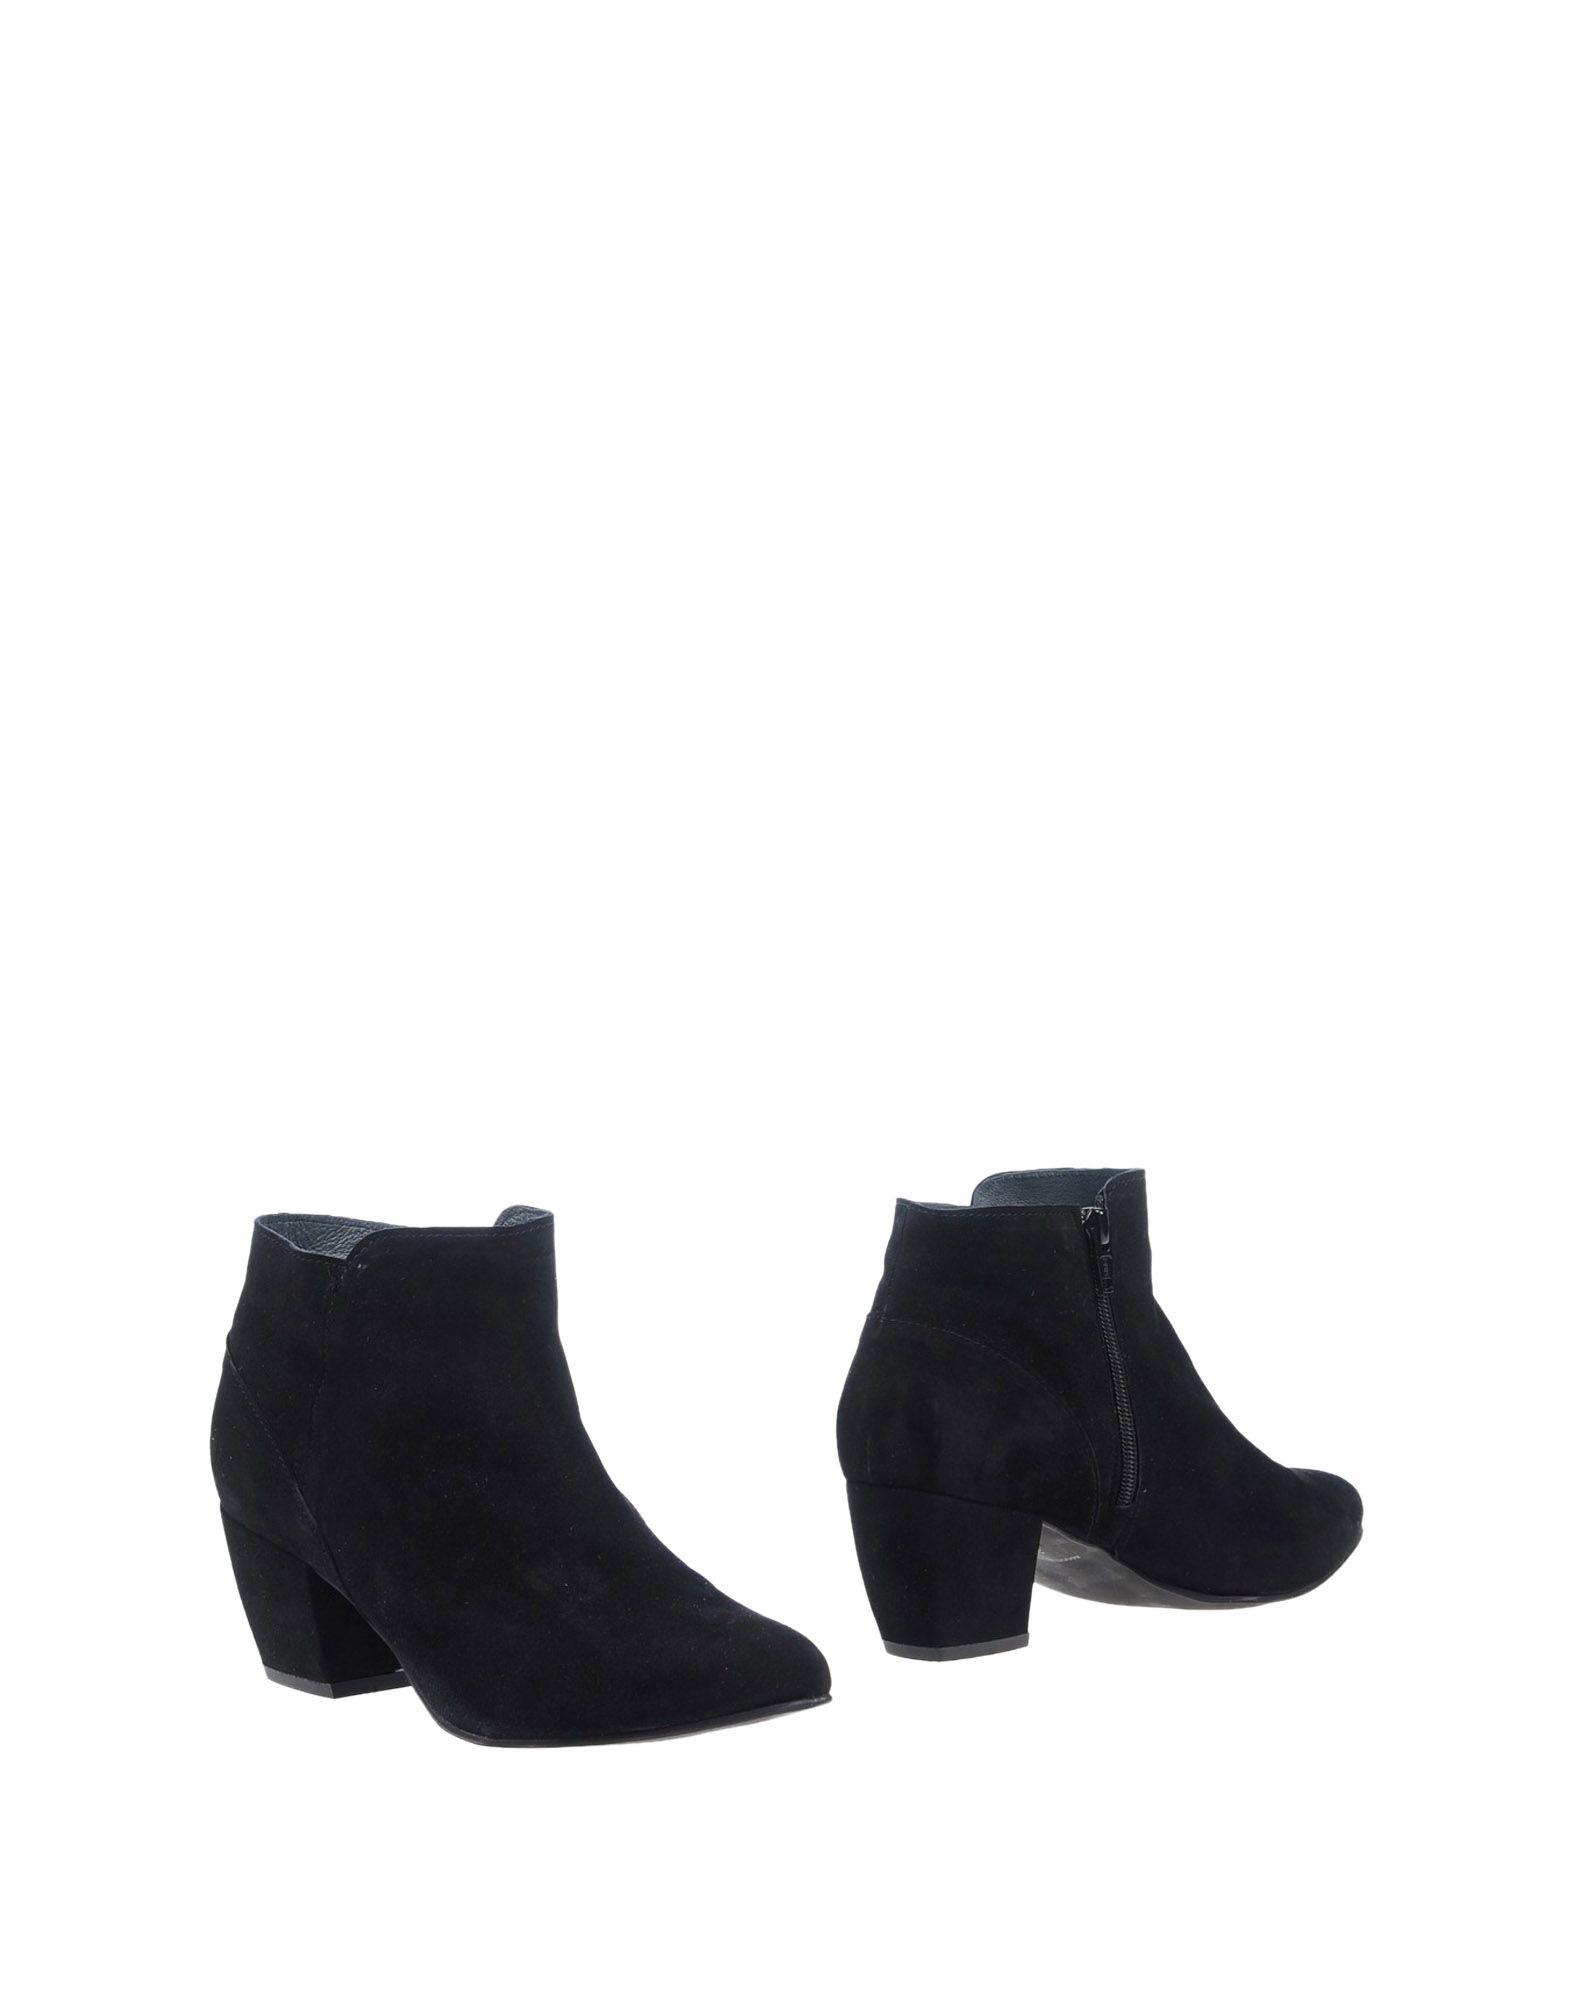 YVES DESFARGE Ankle Boot in Black